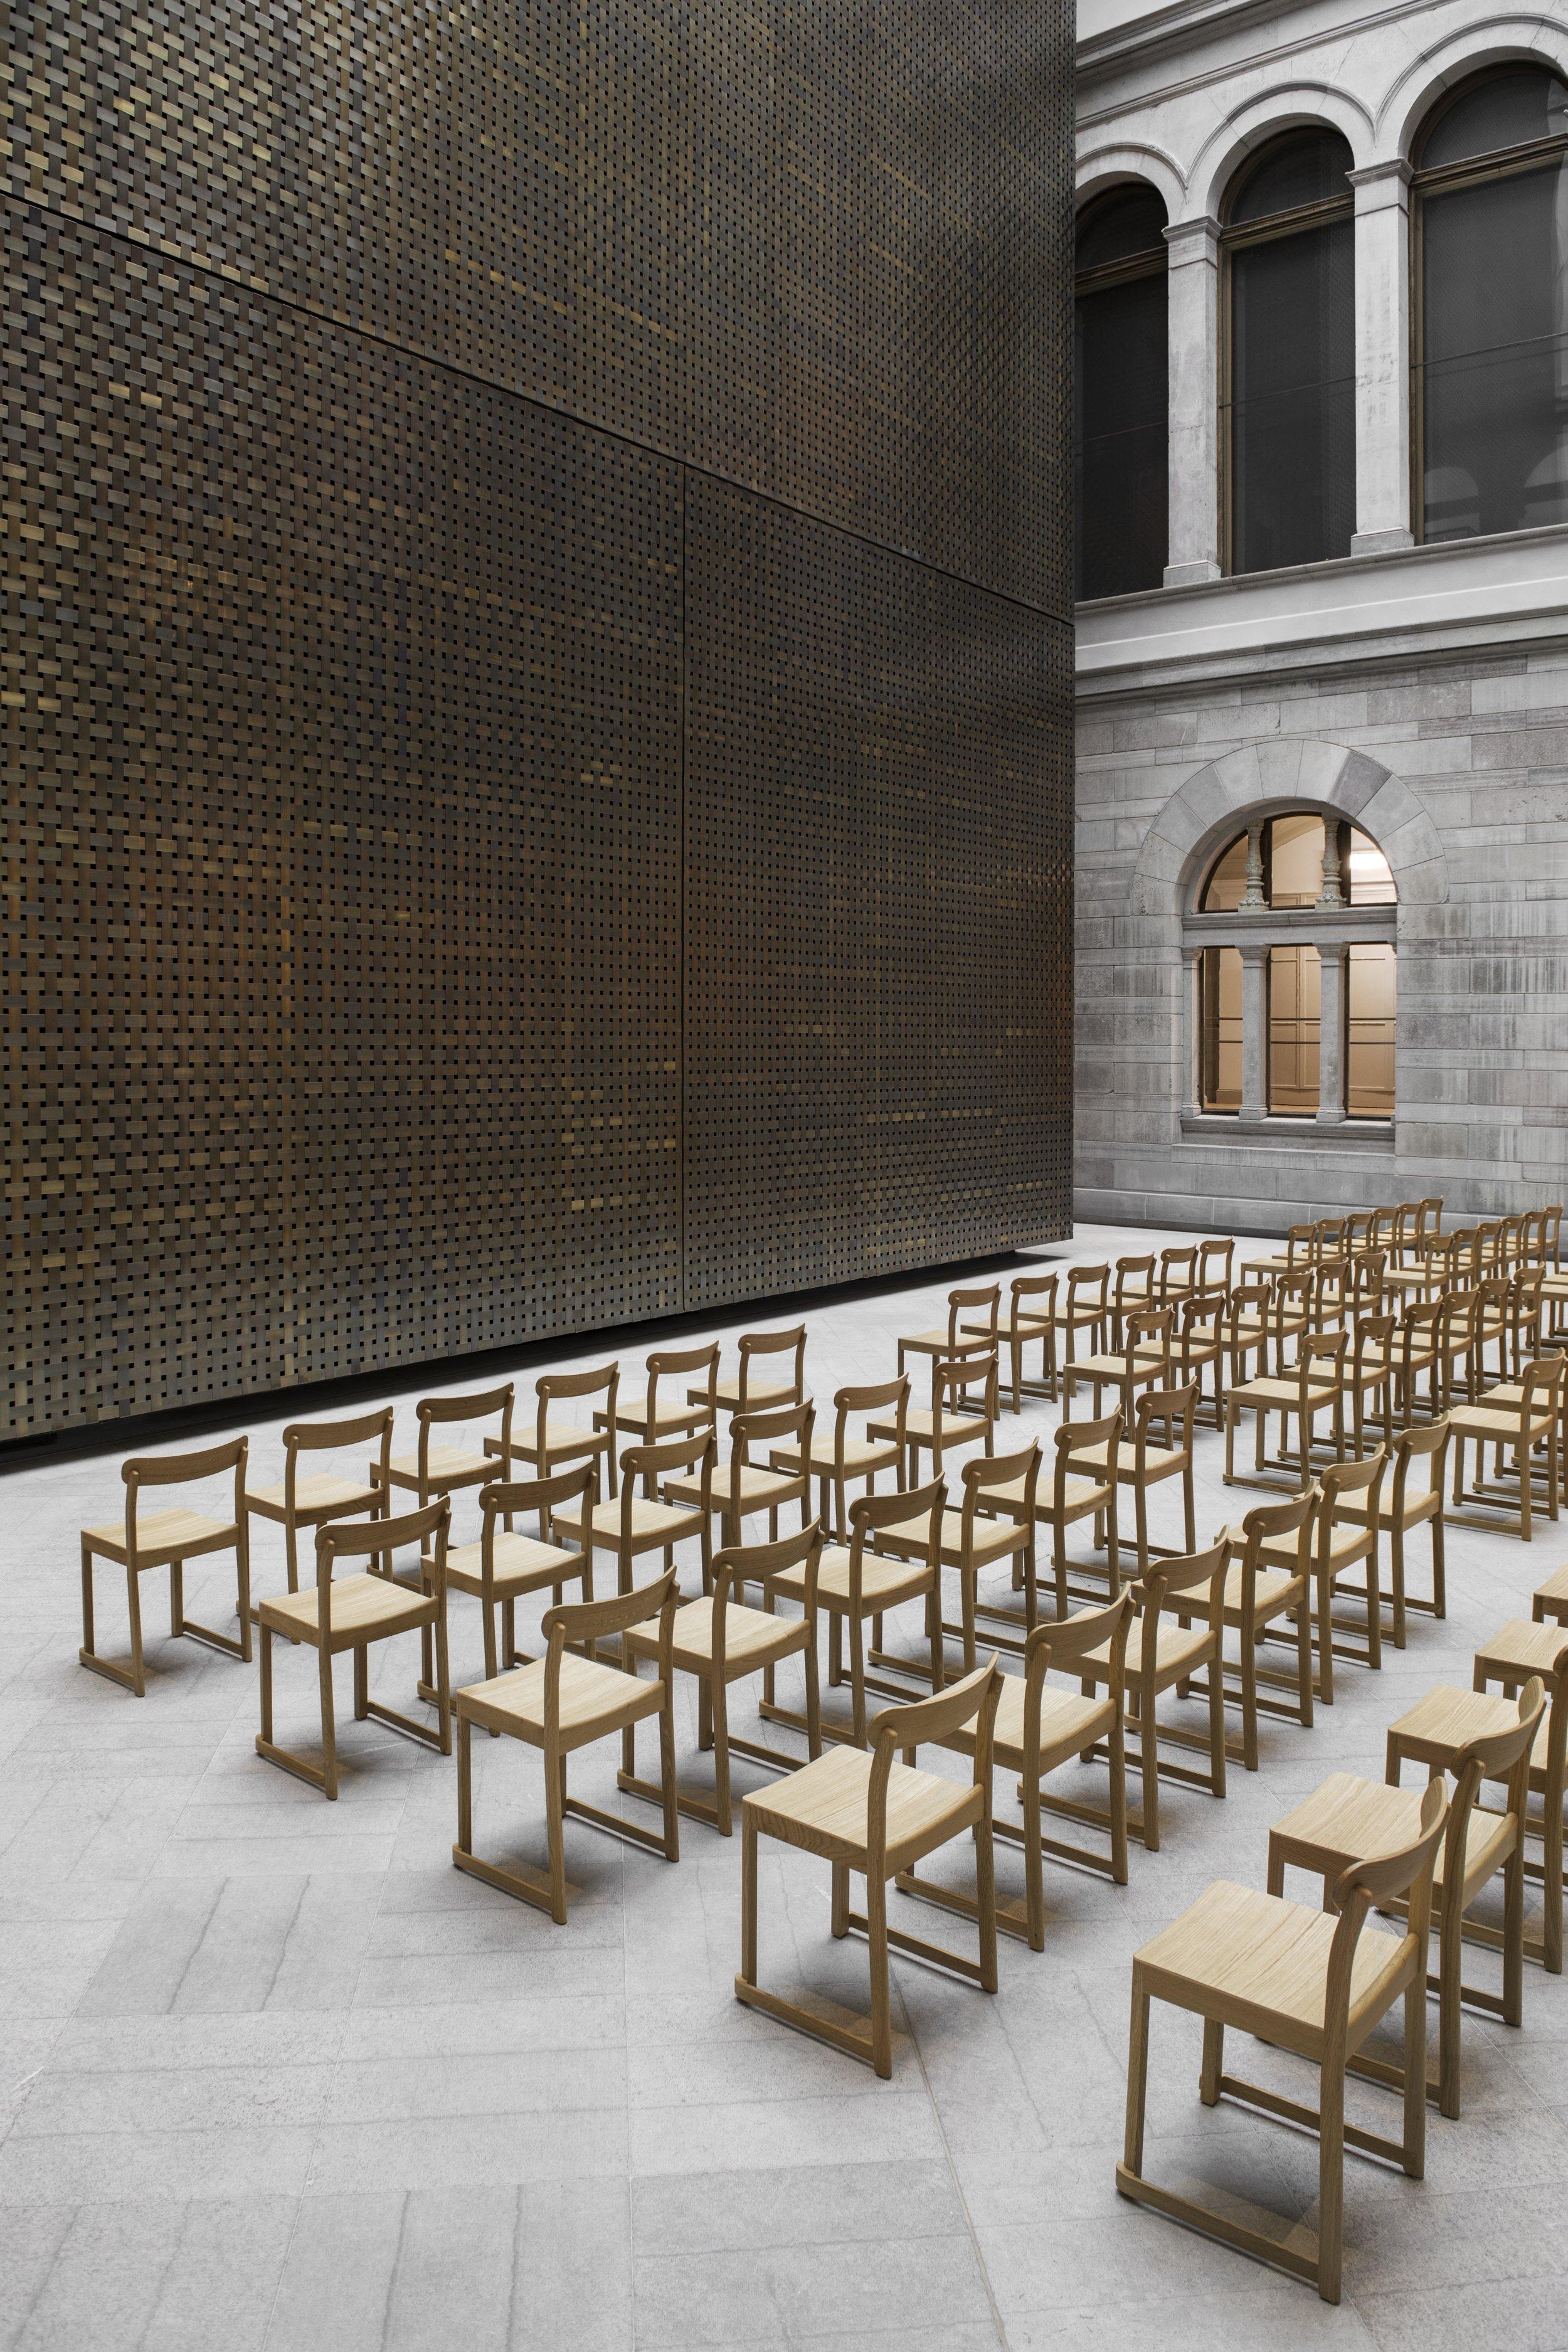 Artek_Atelier-Chair_Nationalmuseum_4_Photo_Erik_Lefvander.jpg